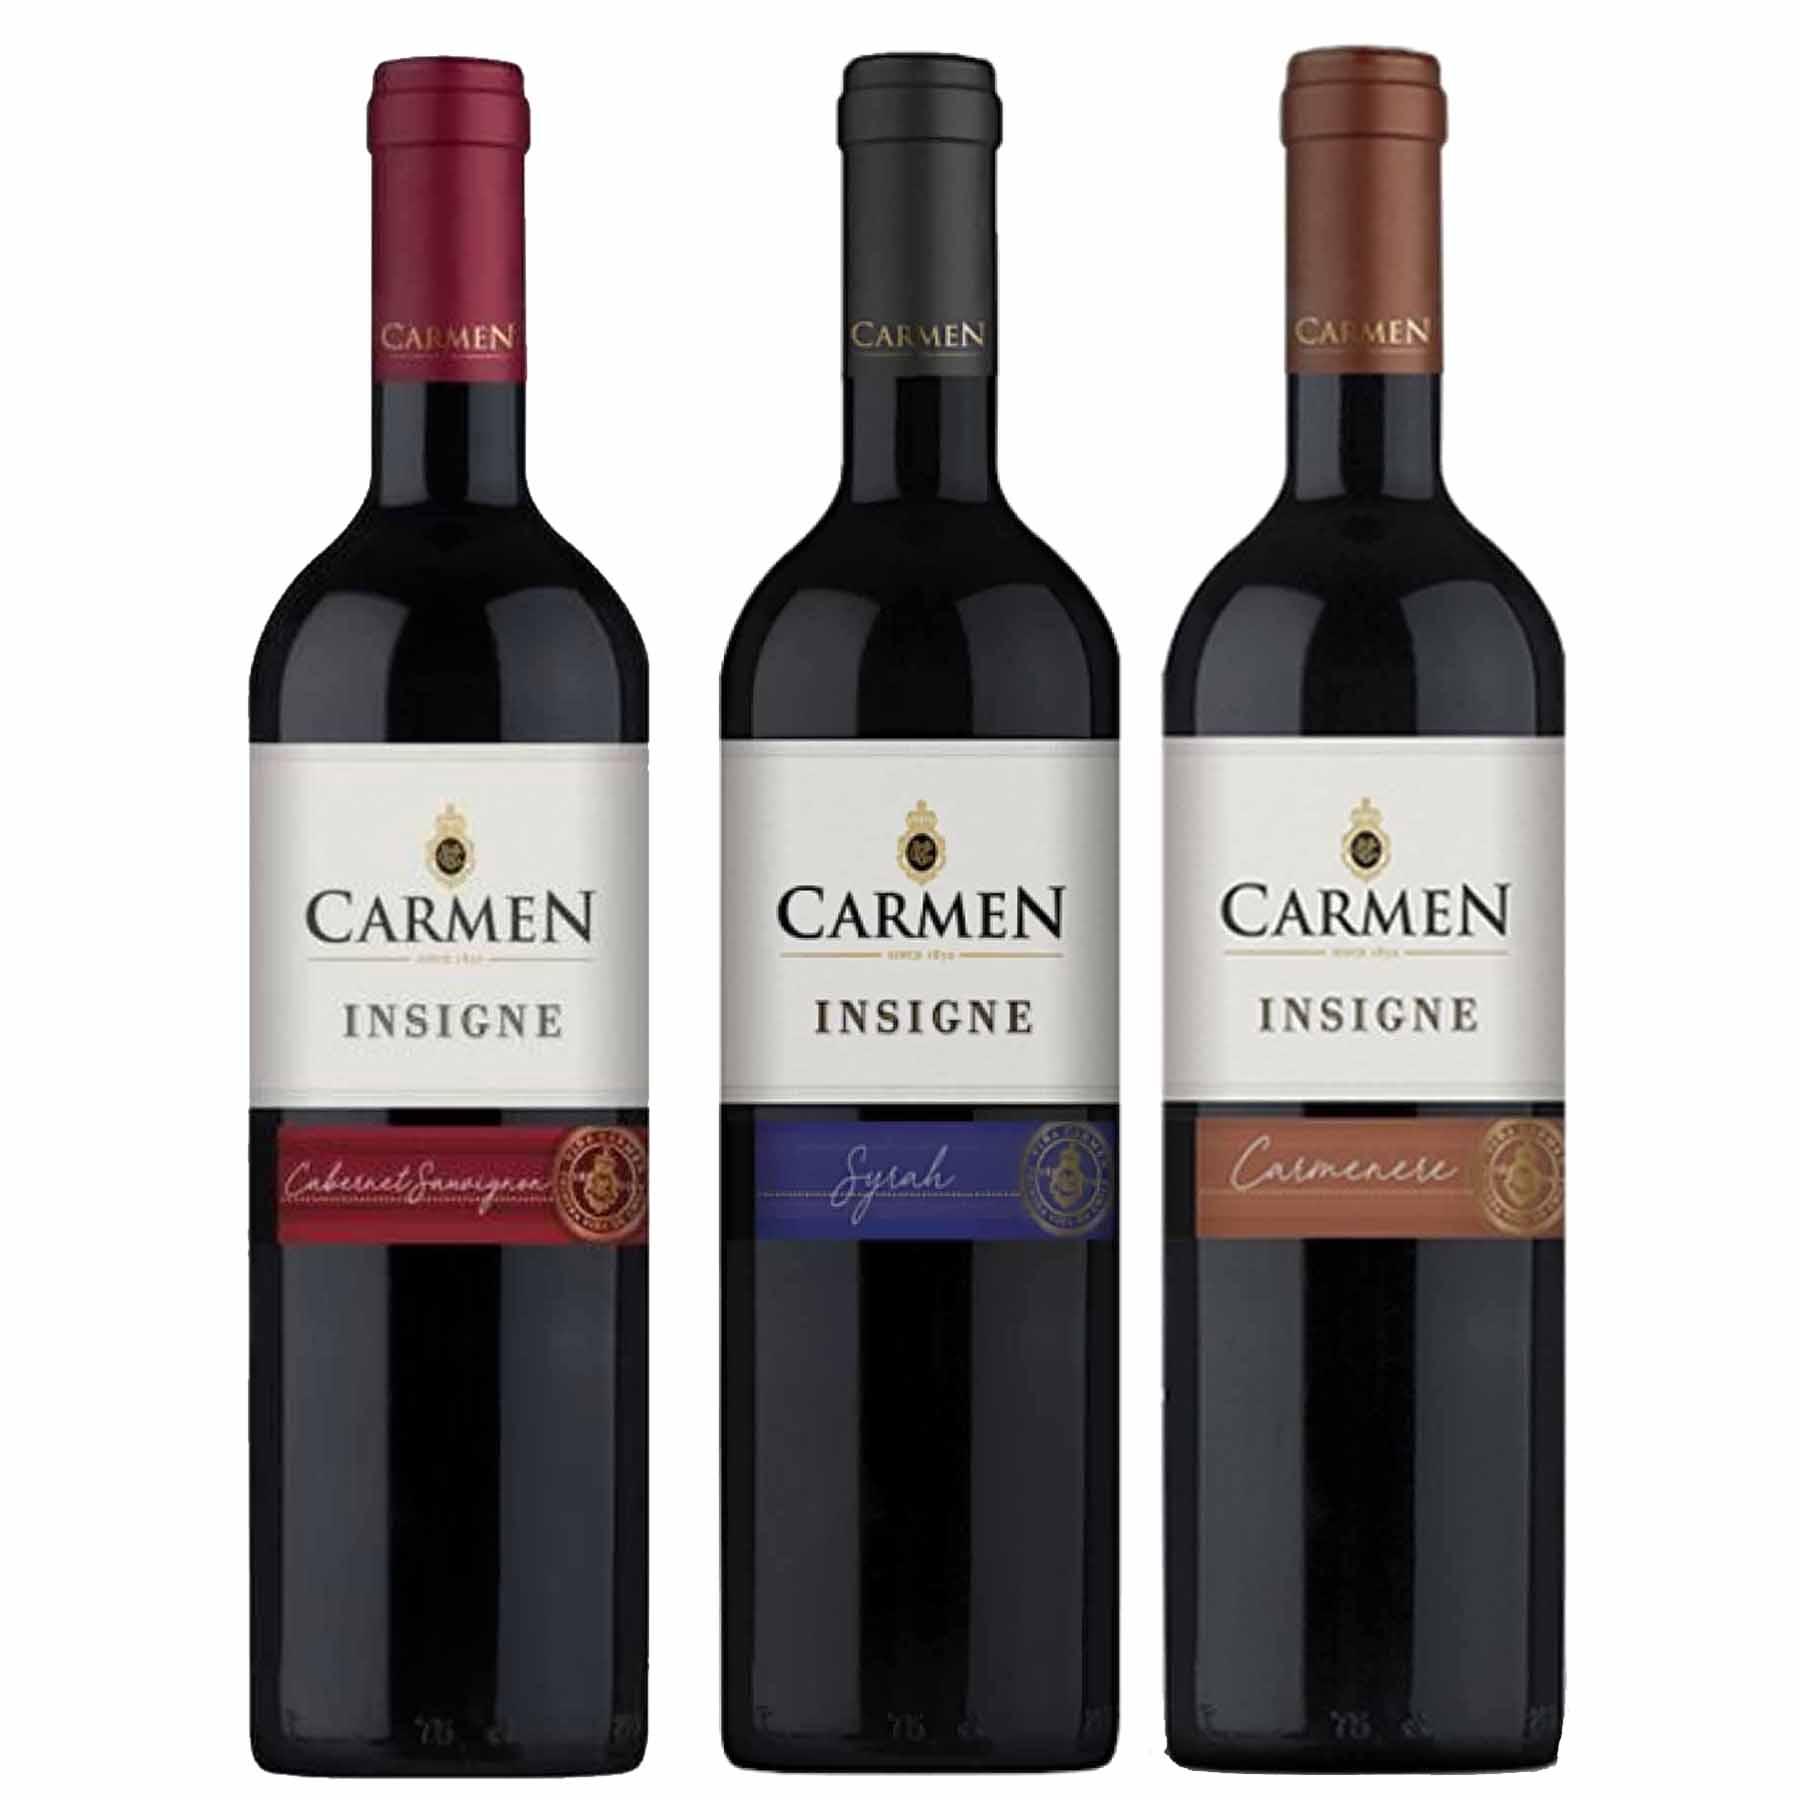 Kit 3 Vinhos Chilenos Carmen Insigne Syrah, Cabernet Sauvignon e Carmenere